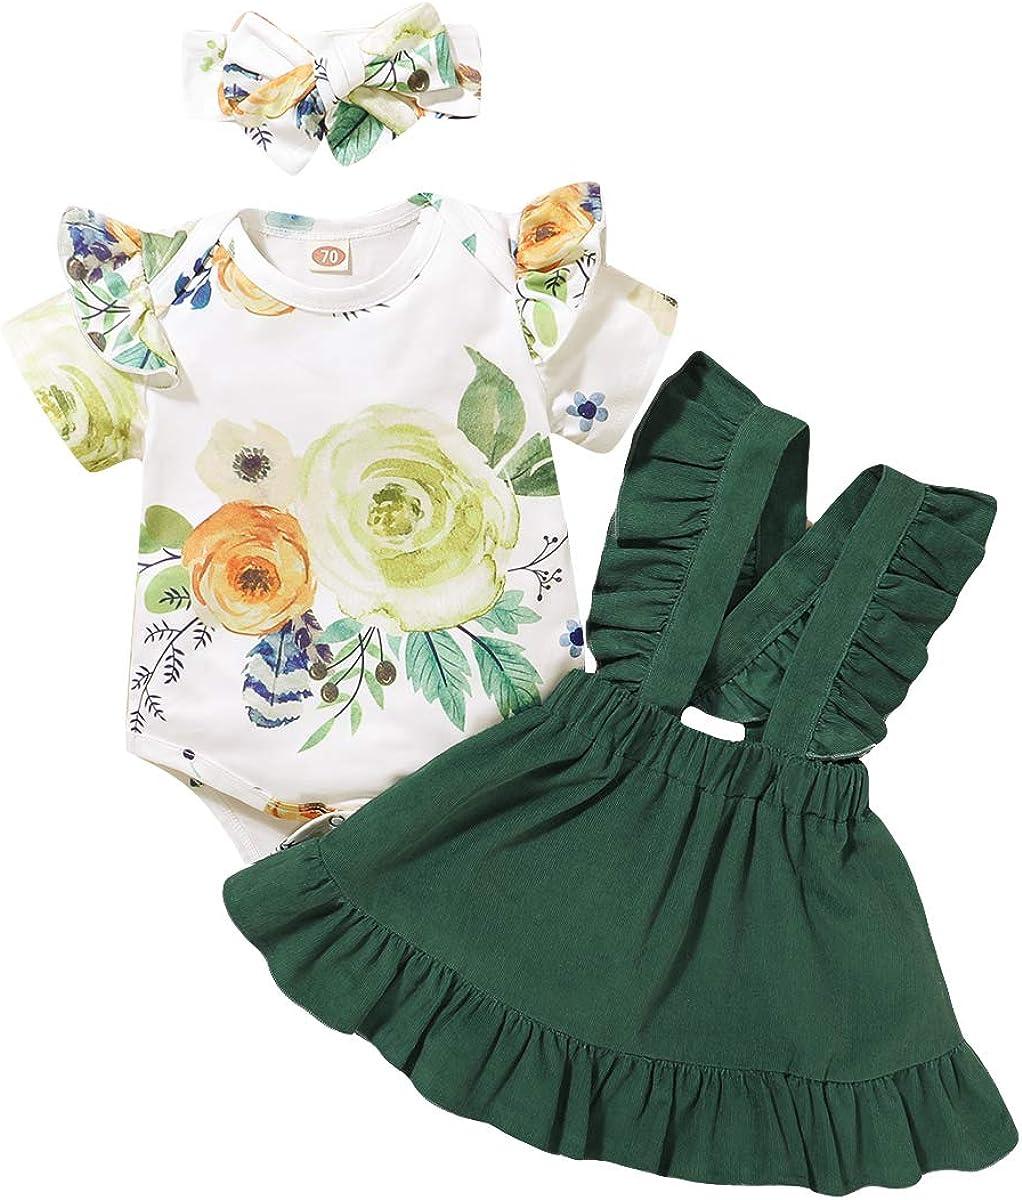 Toddler Baby Girl Suspender Skirt Sets Newborn Floral Ruffle Short Sleeve Romper Headband 3pcs Summer Clothes Outfits